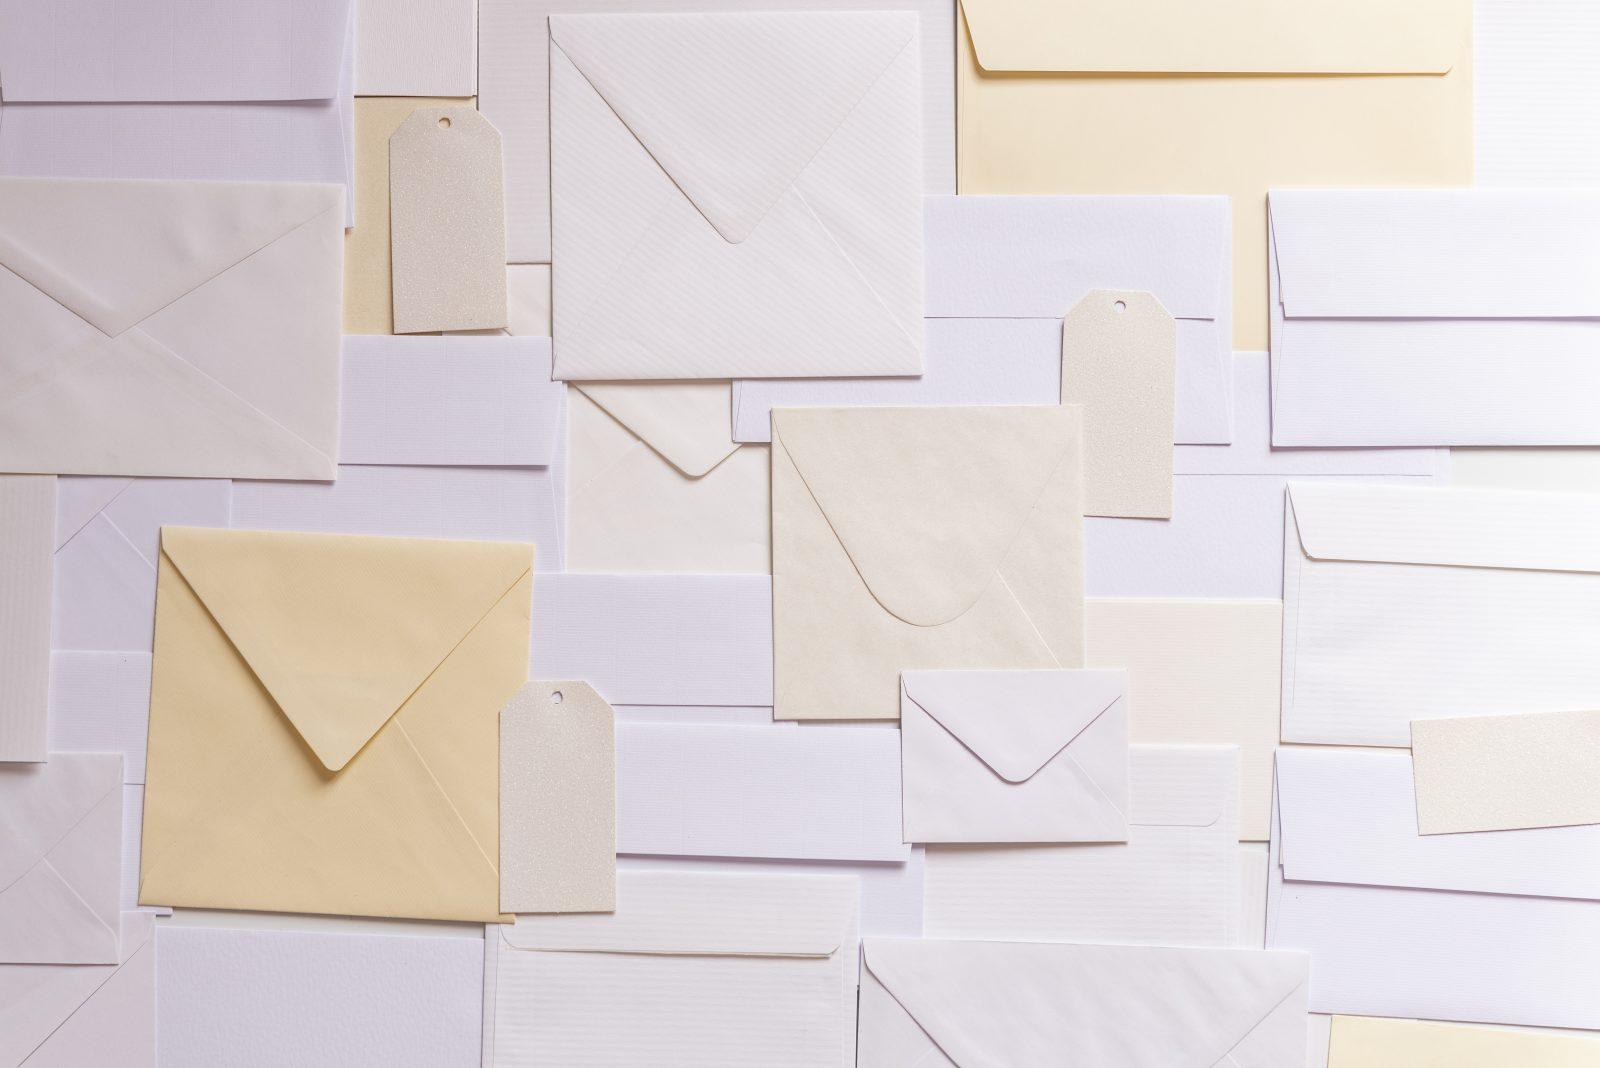 JIERCHEN Prototype Mail and Inquiry by Joanna Kosinska